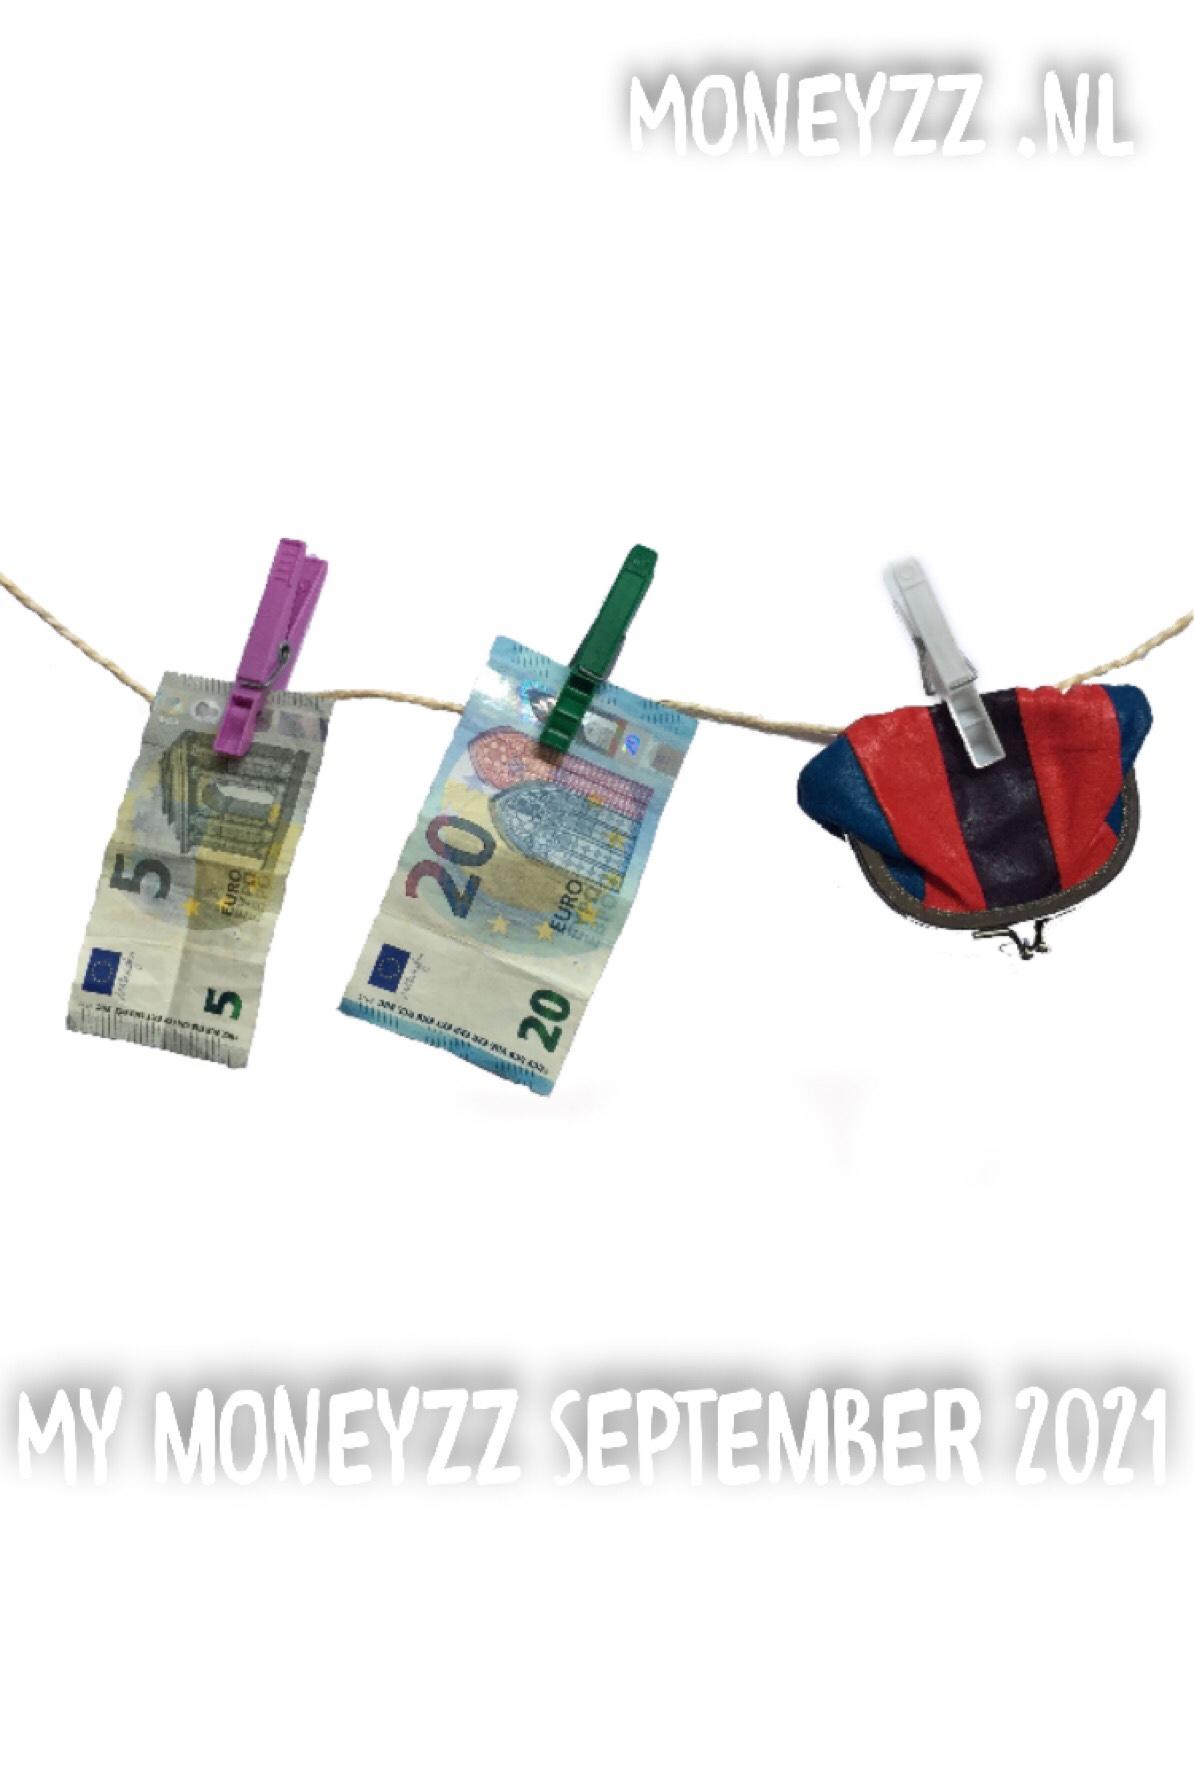 My moneyzz September 2021